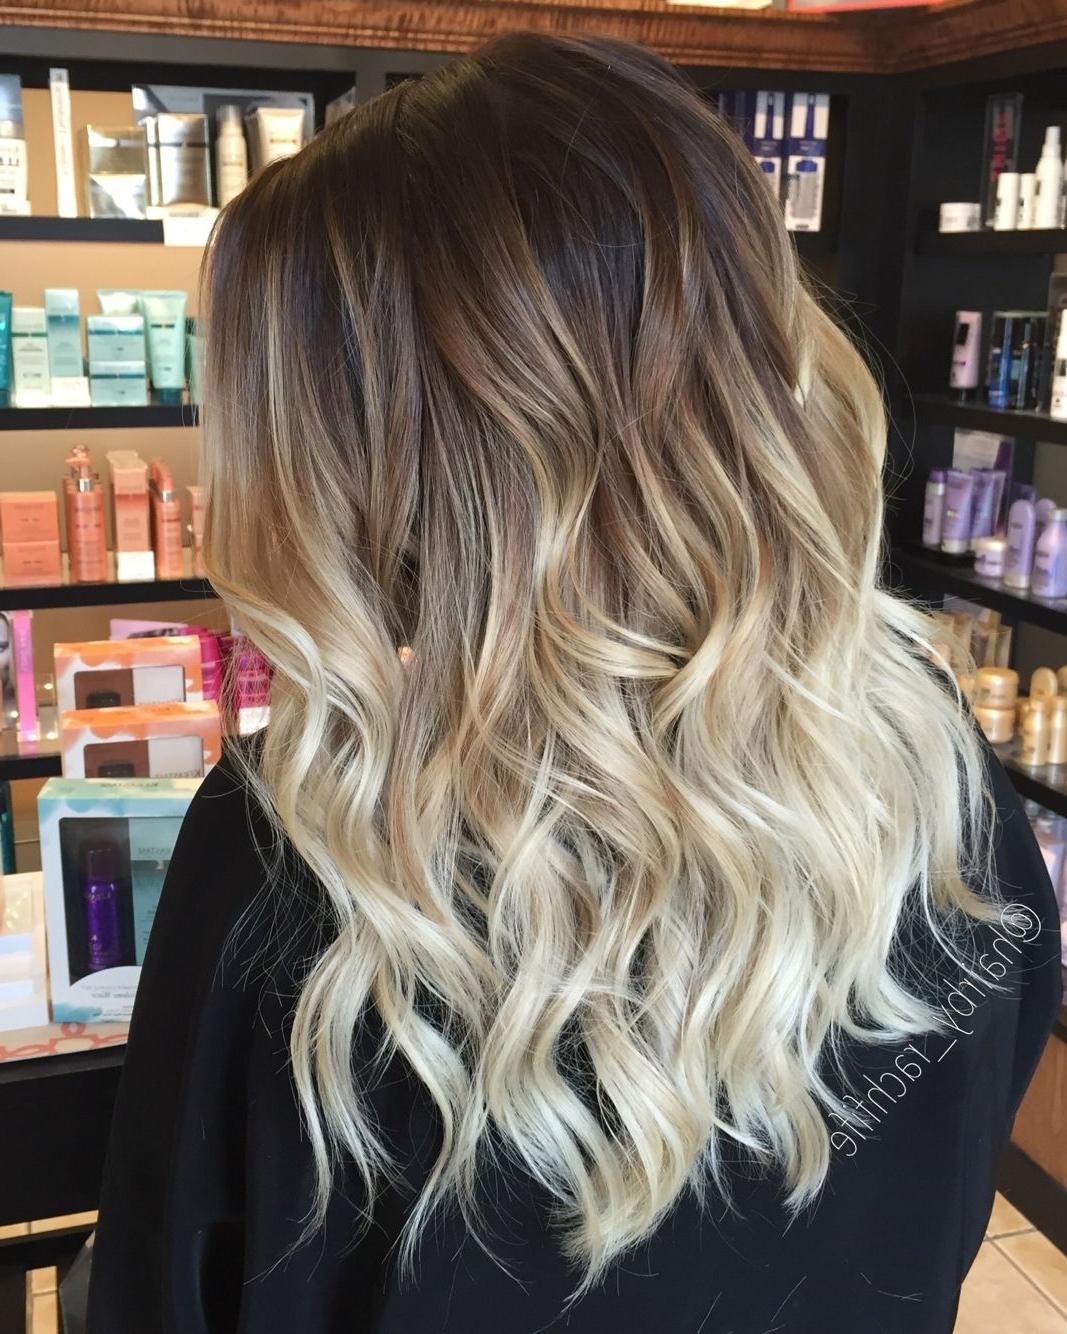 Hair Envy (View 9 of 20)